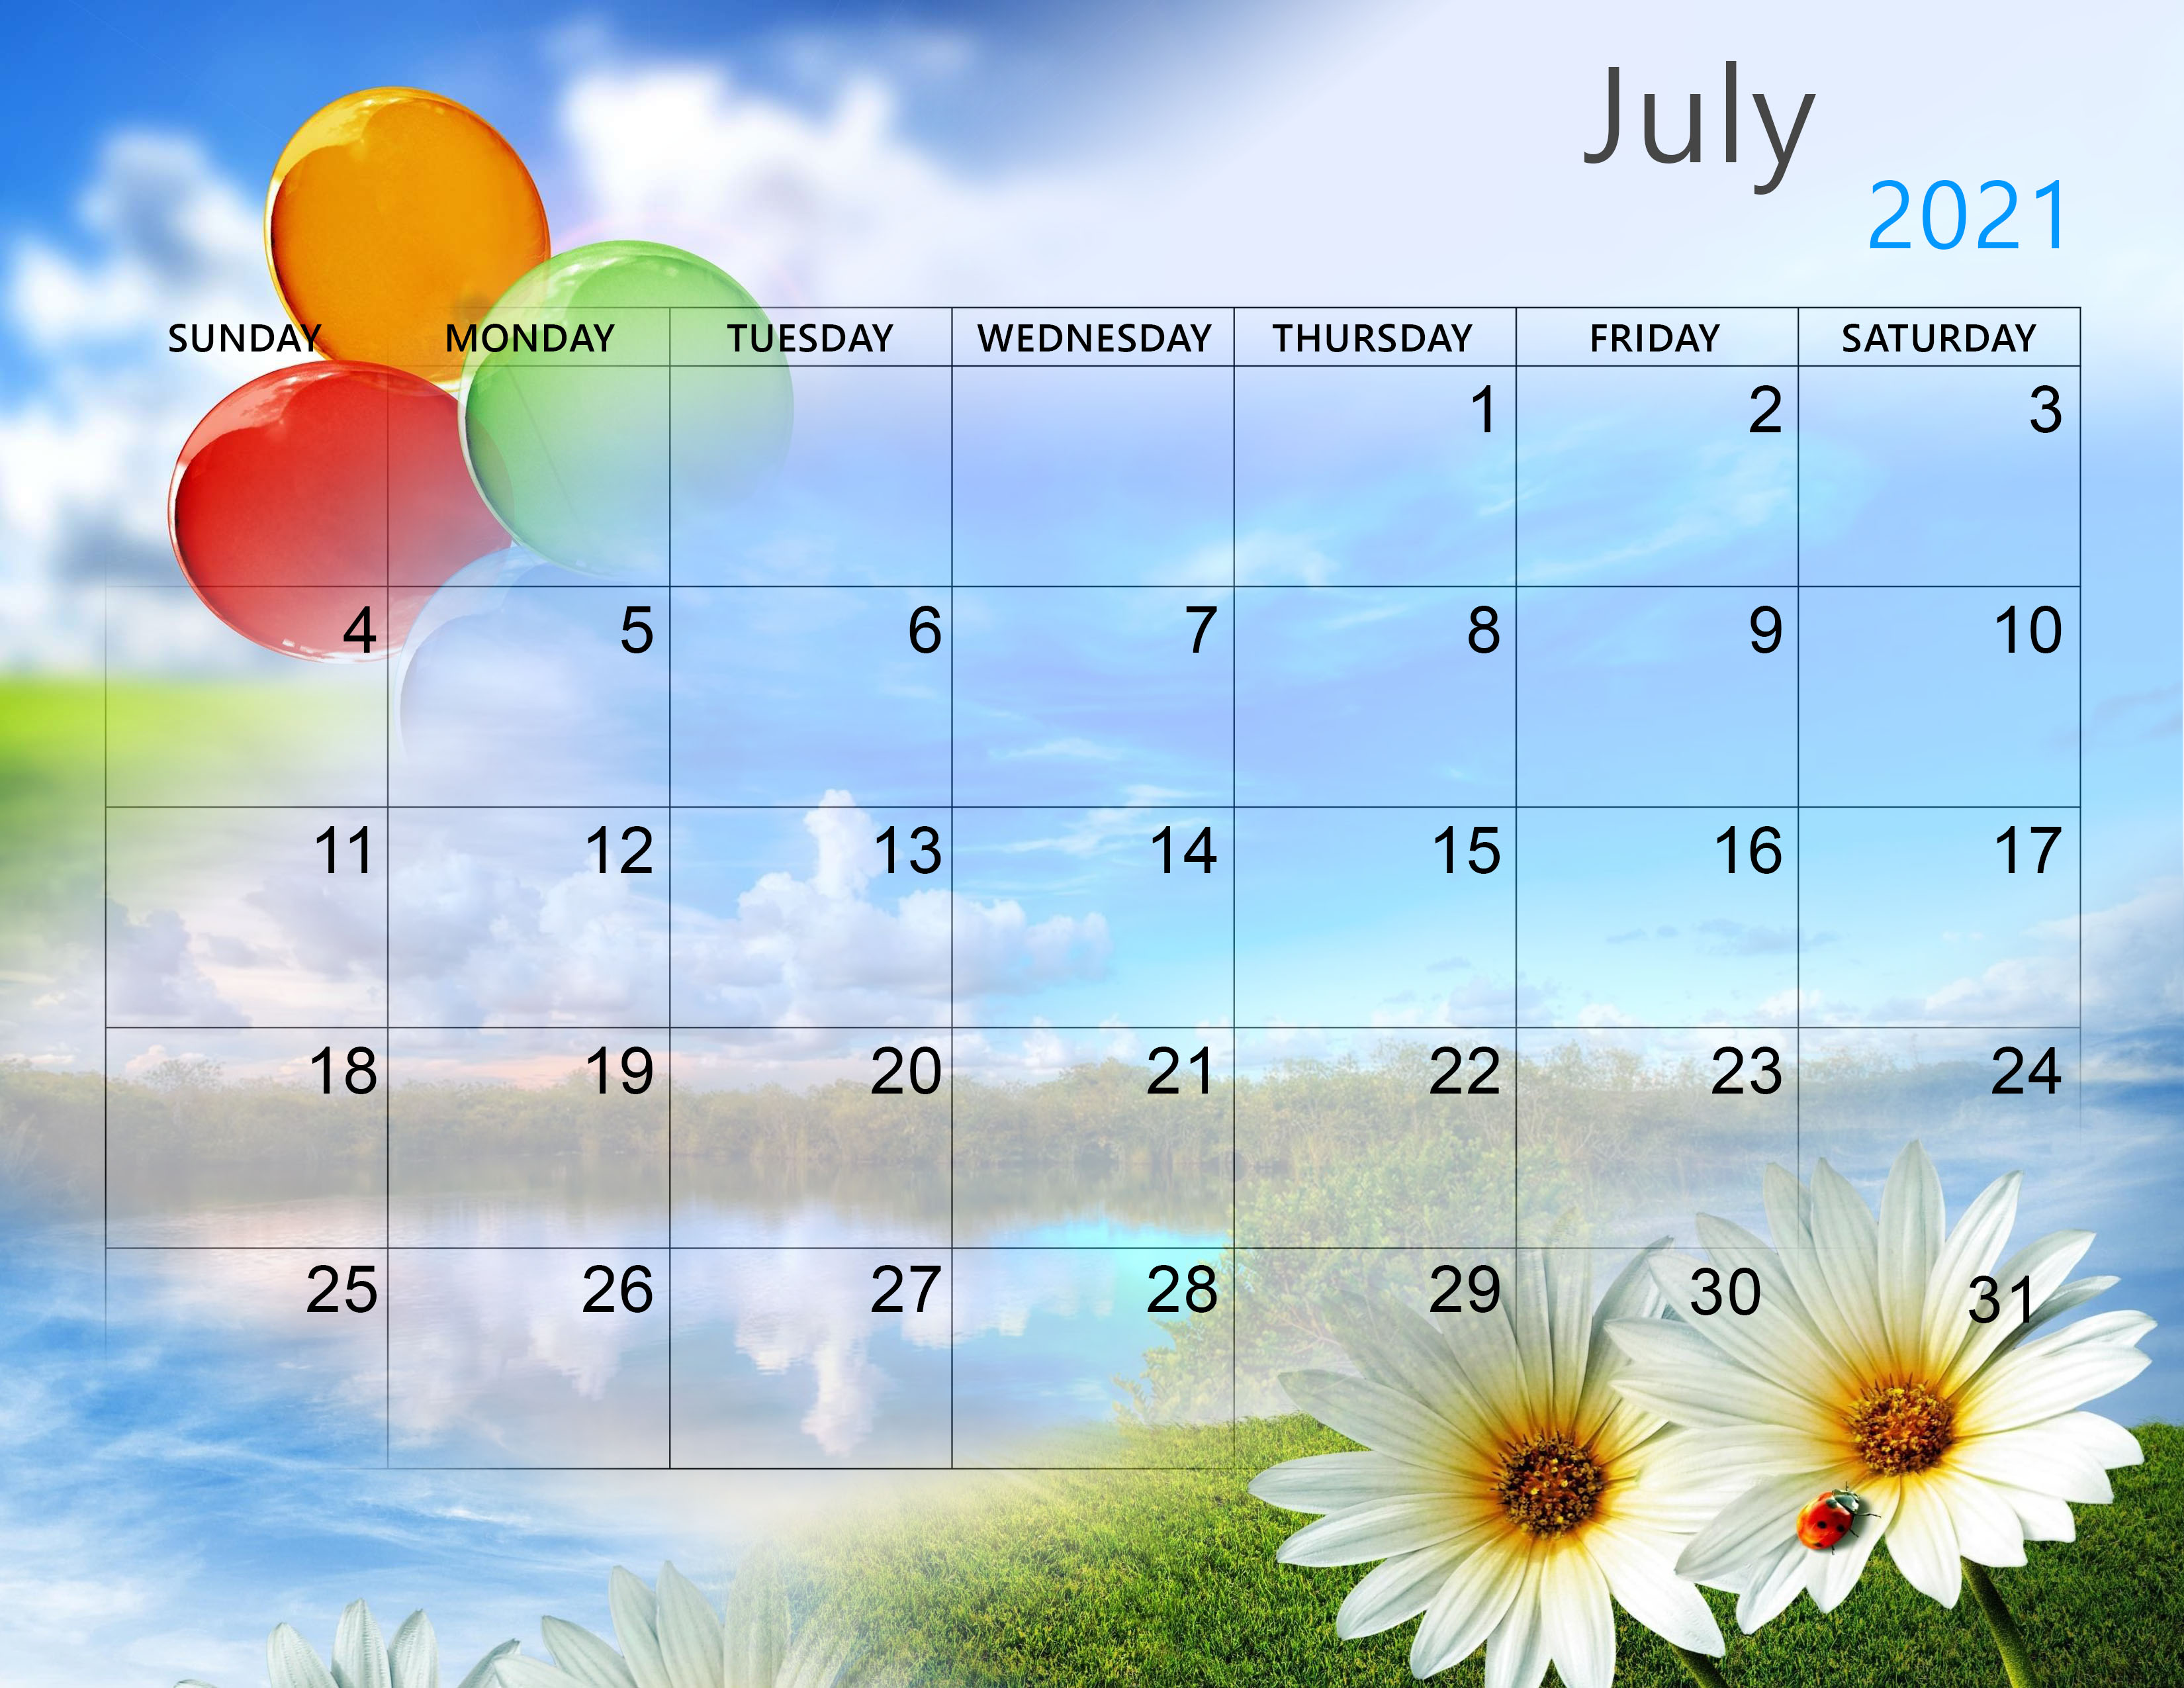 Google calendar doesn't show any holidays by default. Online Cute July 2021 Calendar - Eventskarma